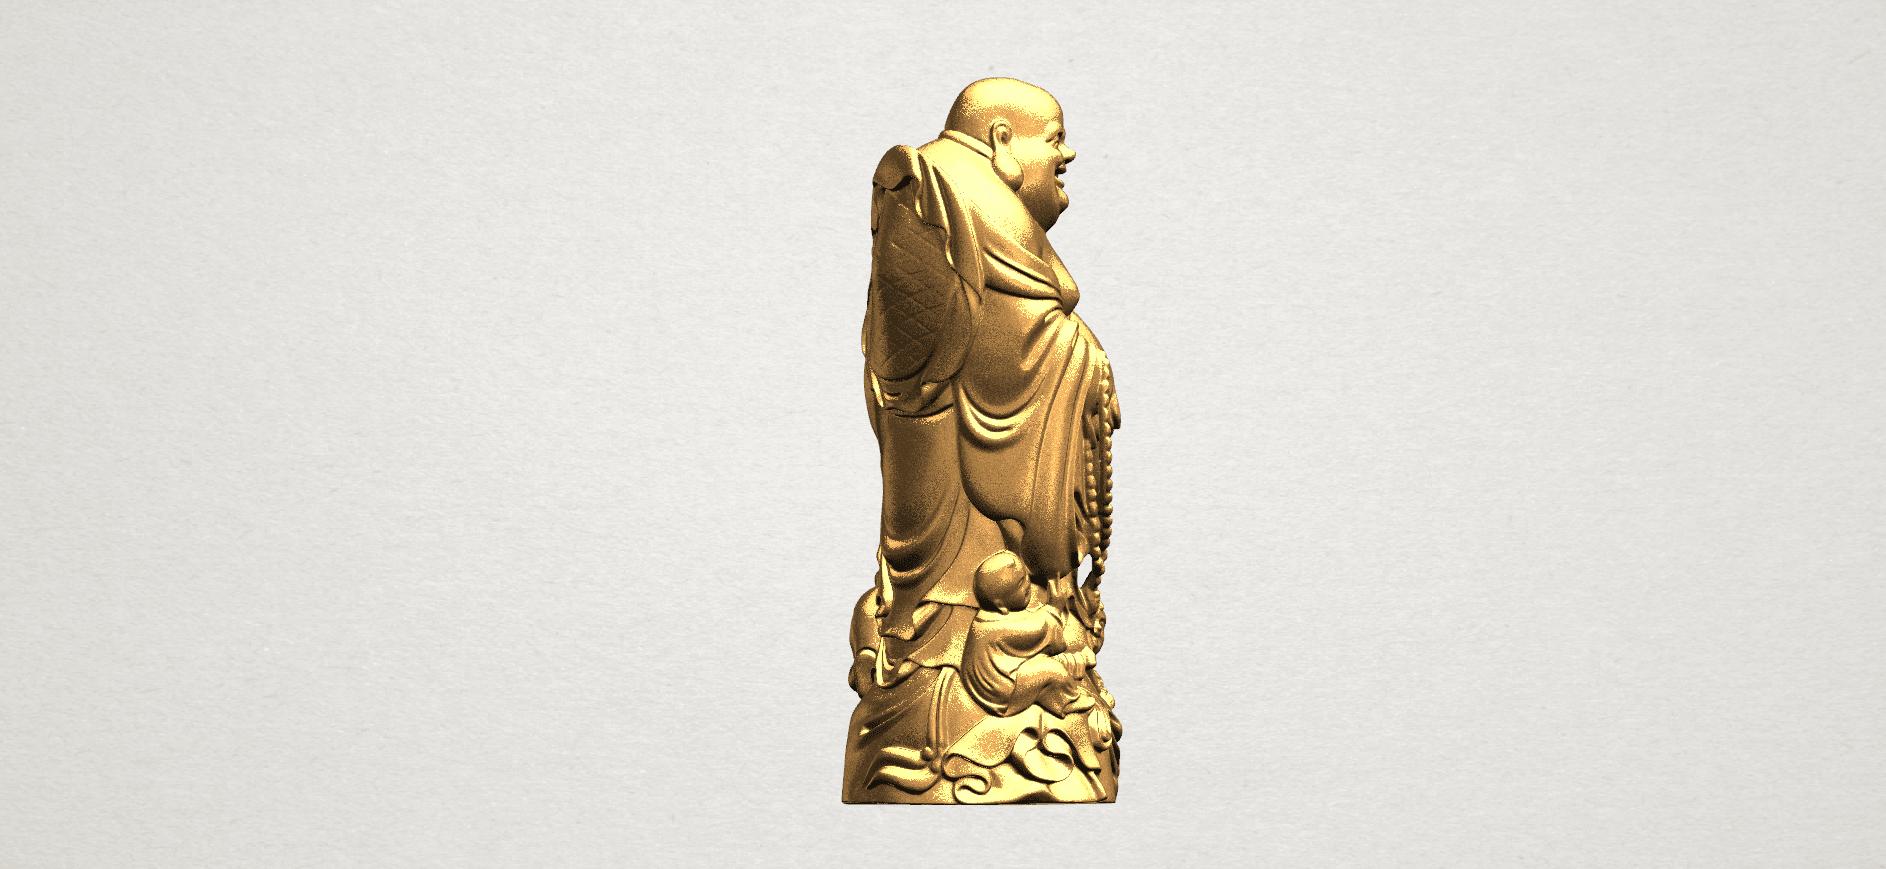 TDA0070 Metteyya Buddha 03 - 88mm - A07.png Download free STL file Metteyya Buddha 03 • 3D printing object, GeorgesNikkei